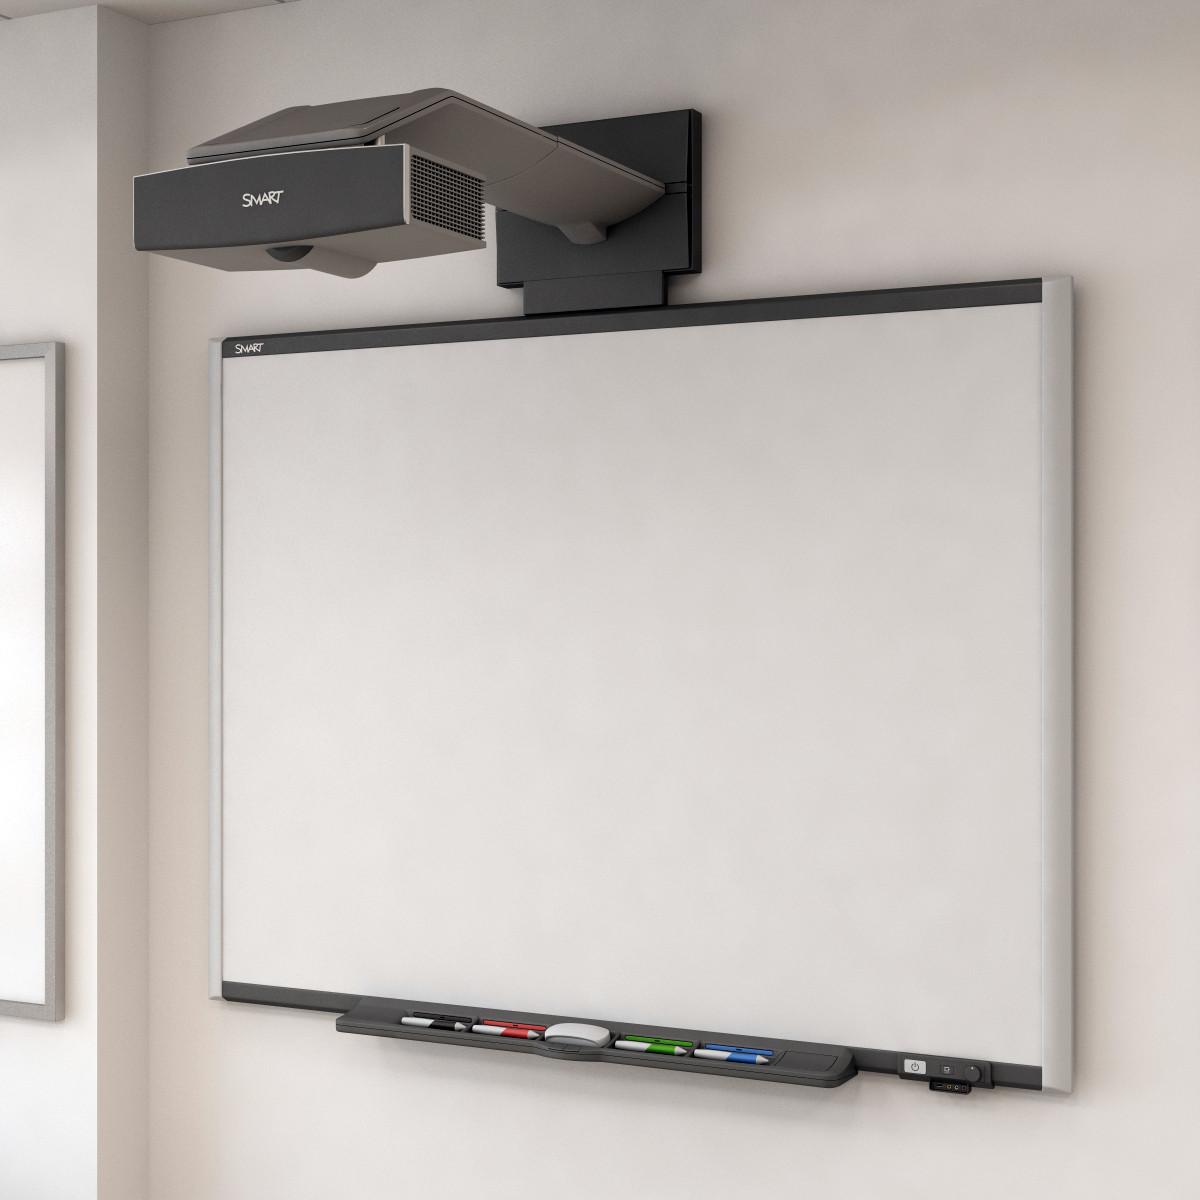 Smart Forfour 2006 3d Model: Interactive Whiteboard 3d Model